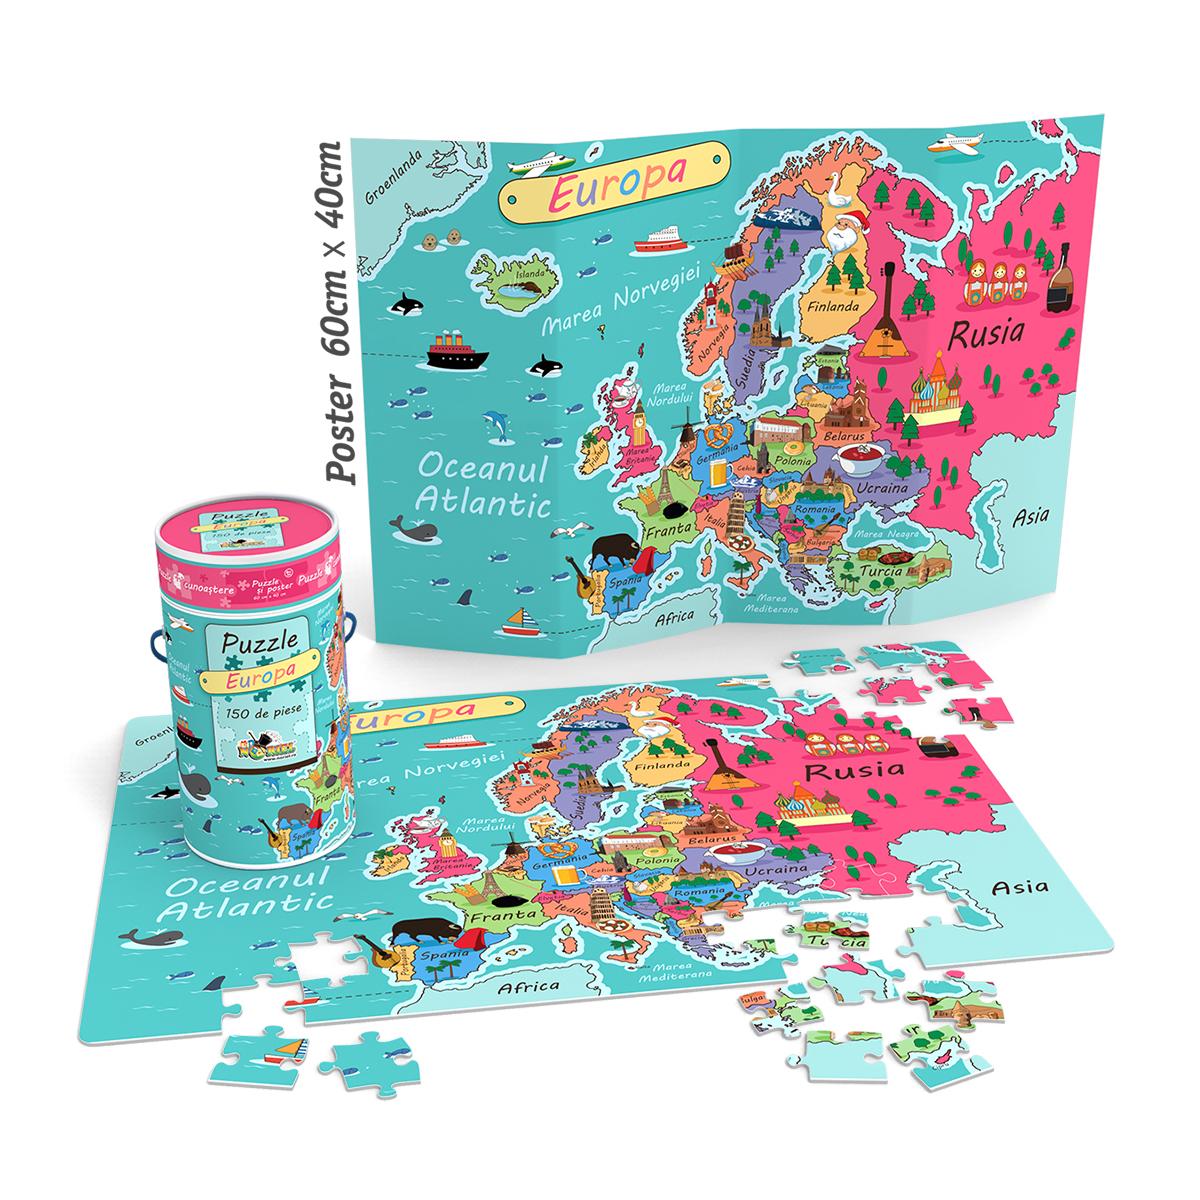 Puzzle Cunoastere Noriel - Harta Europei. 150 piese